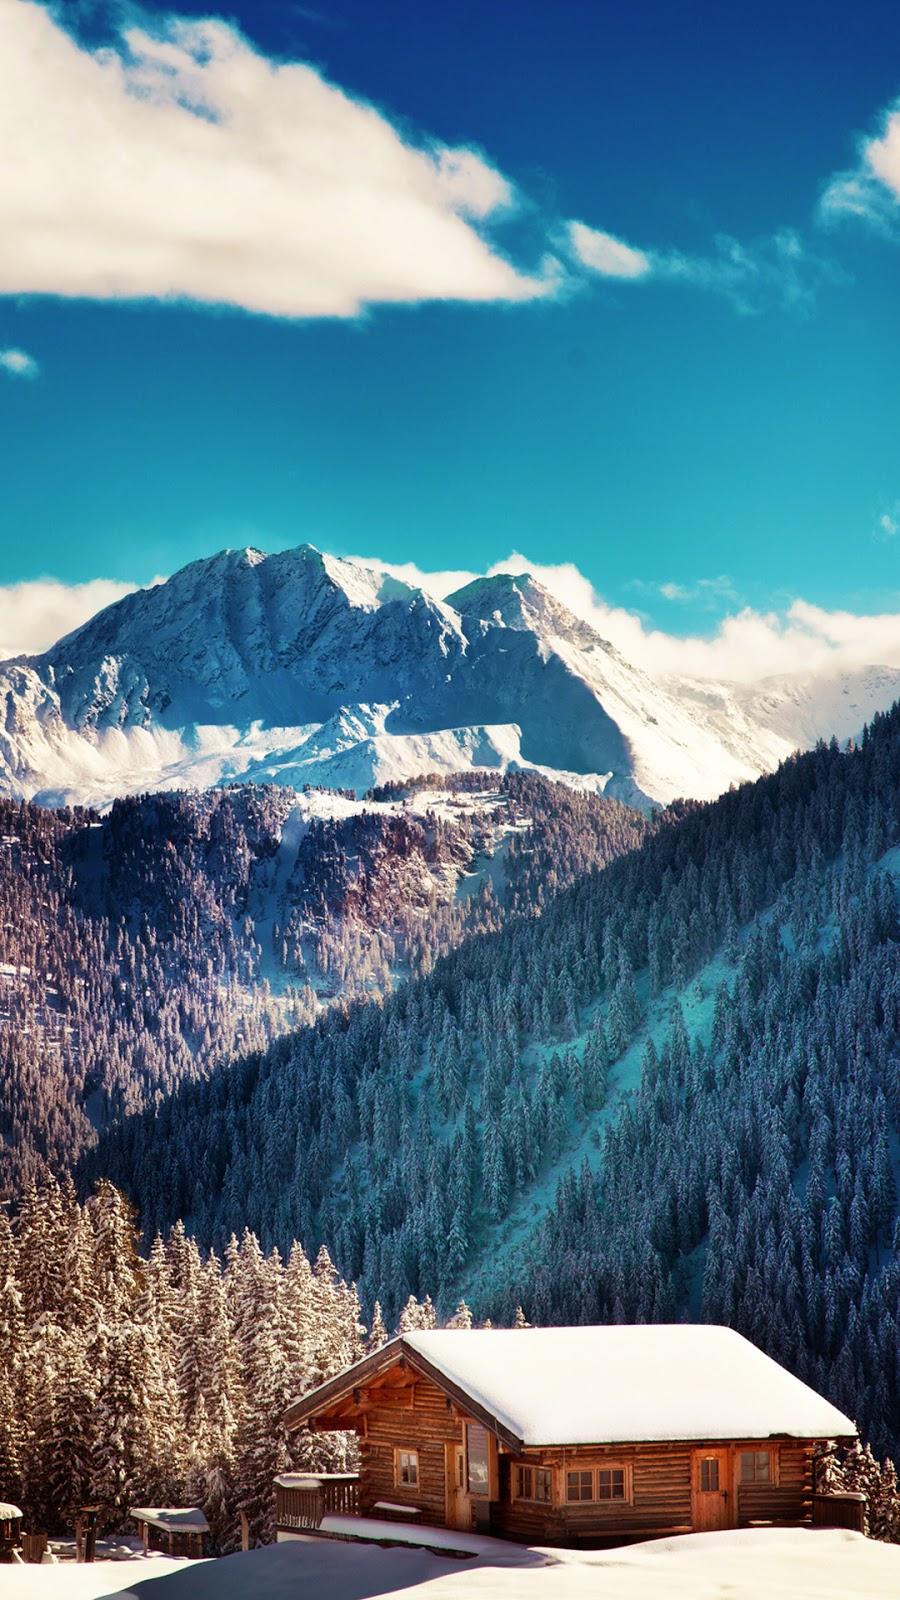 Mountains Chalet Blue Sky Wallpaper